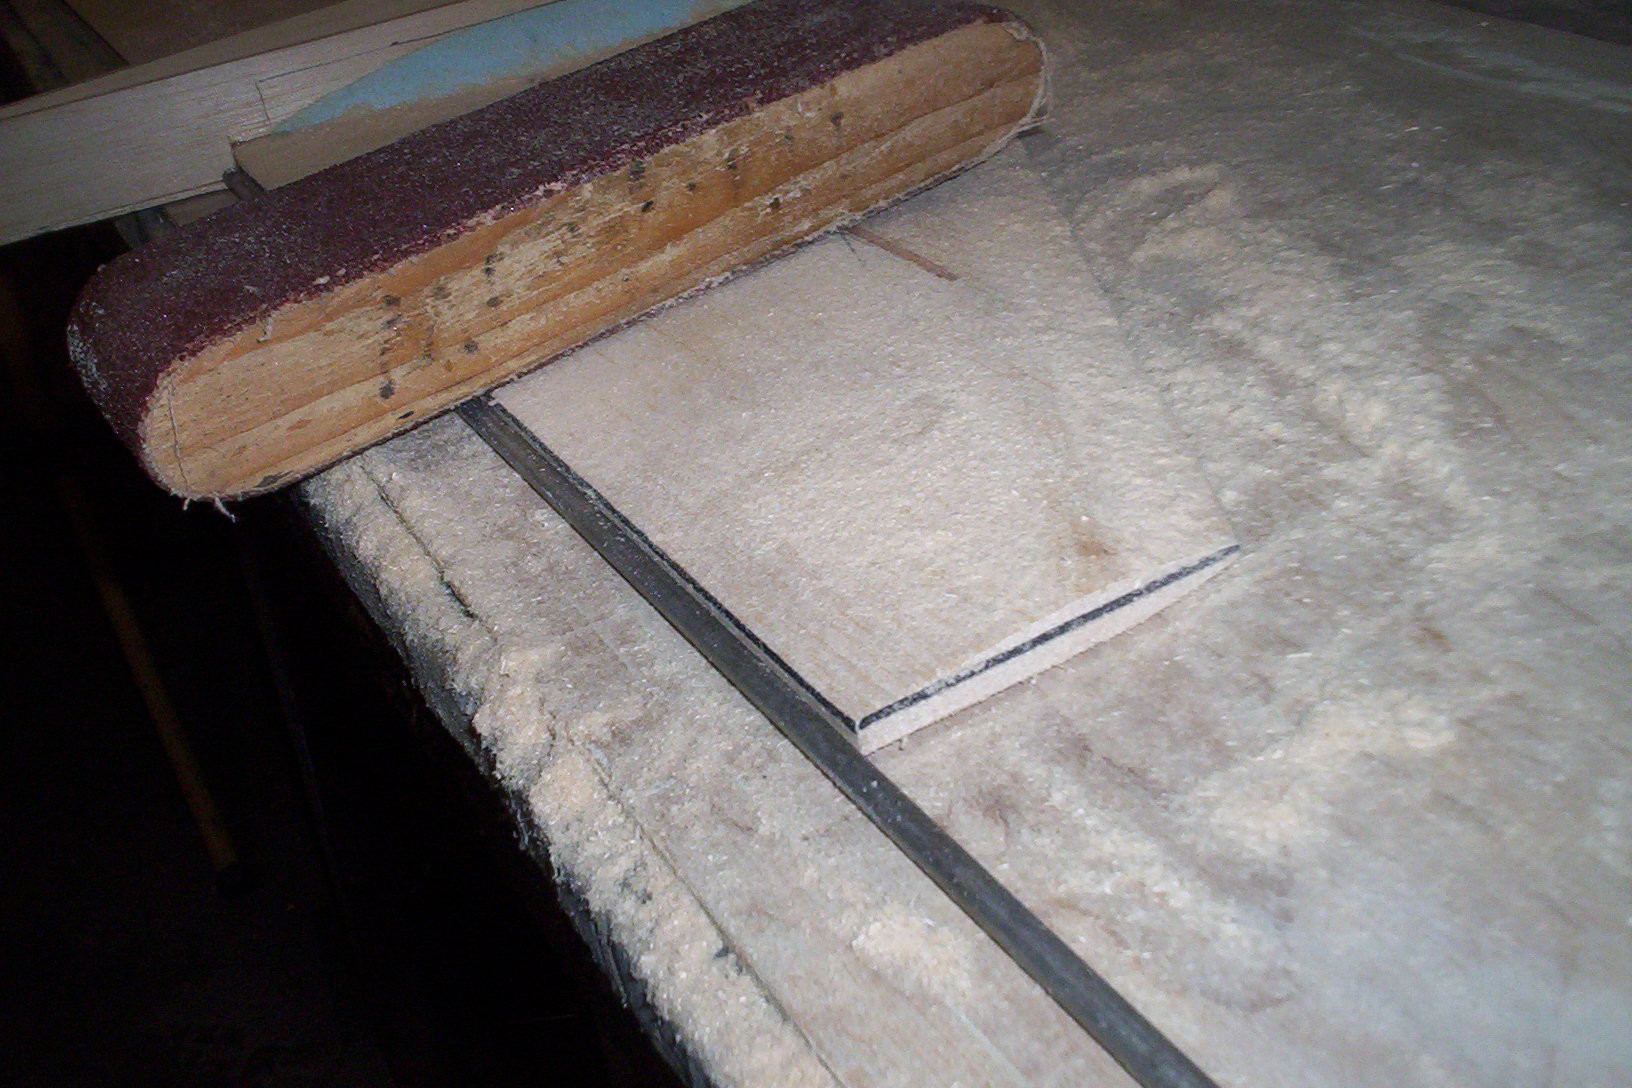 aaa hardwood flooring etobicoke of fora cyclon 15 powered speed plane page 4 rcu forums within itz lookin mo betta